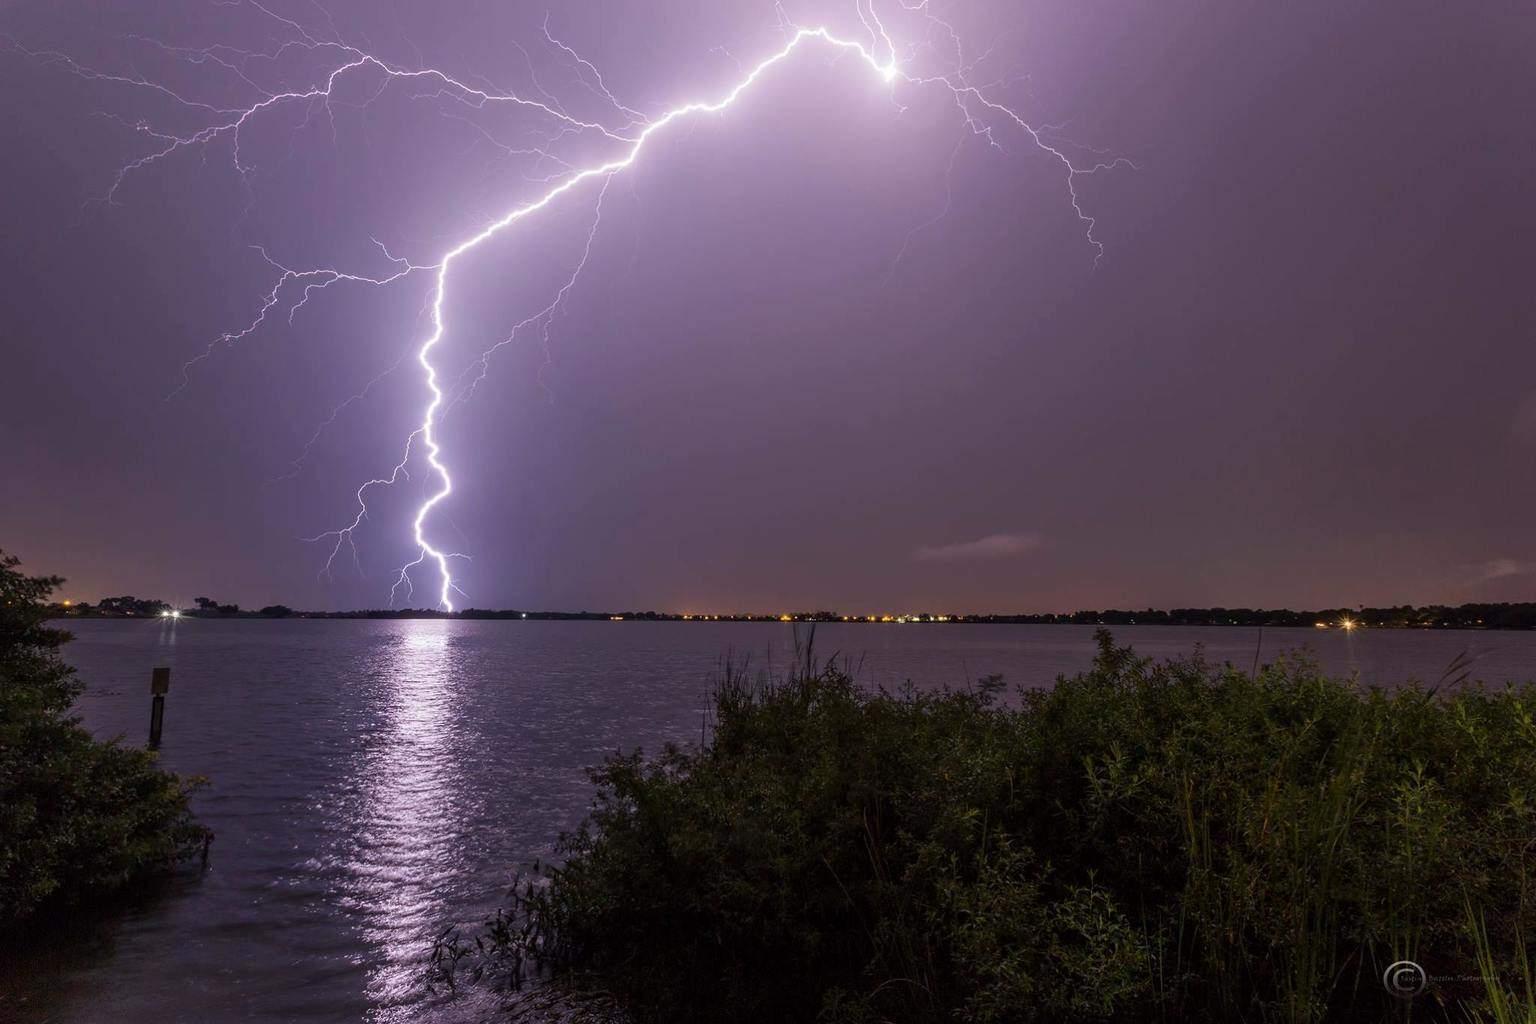 Pretty massive bolt in Waverly, Florida tonight. Canon 6d, 17mm, iso 500, f13, 10 seconds